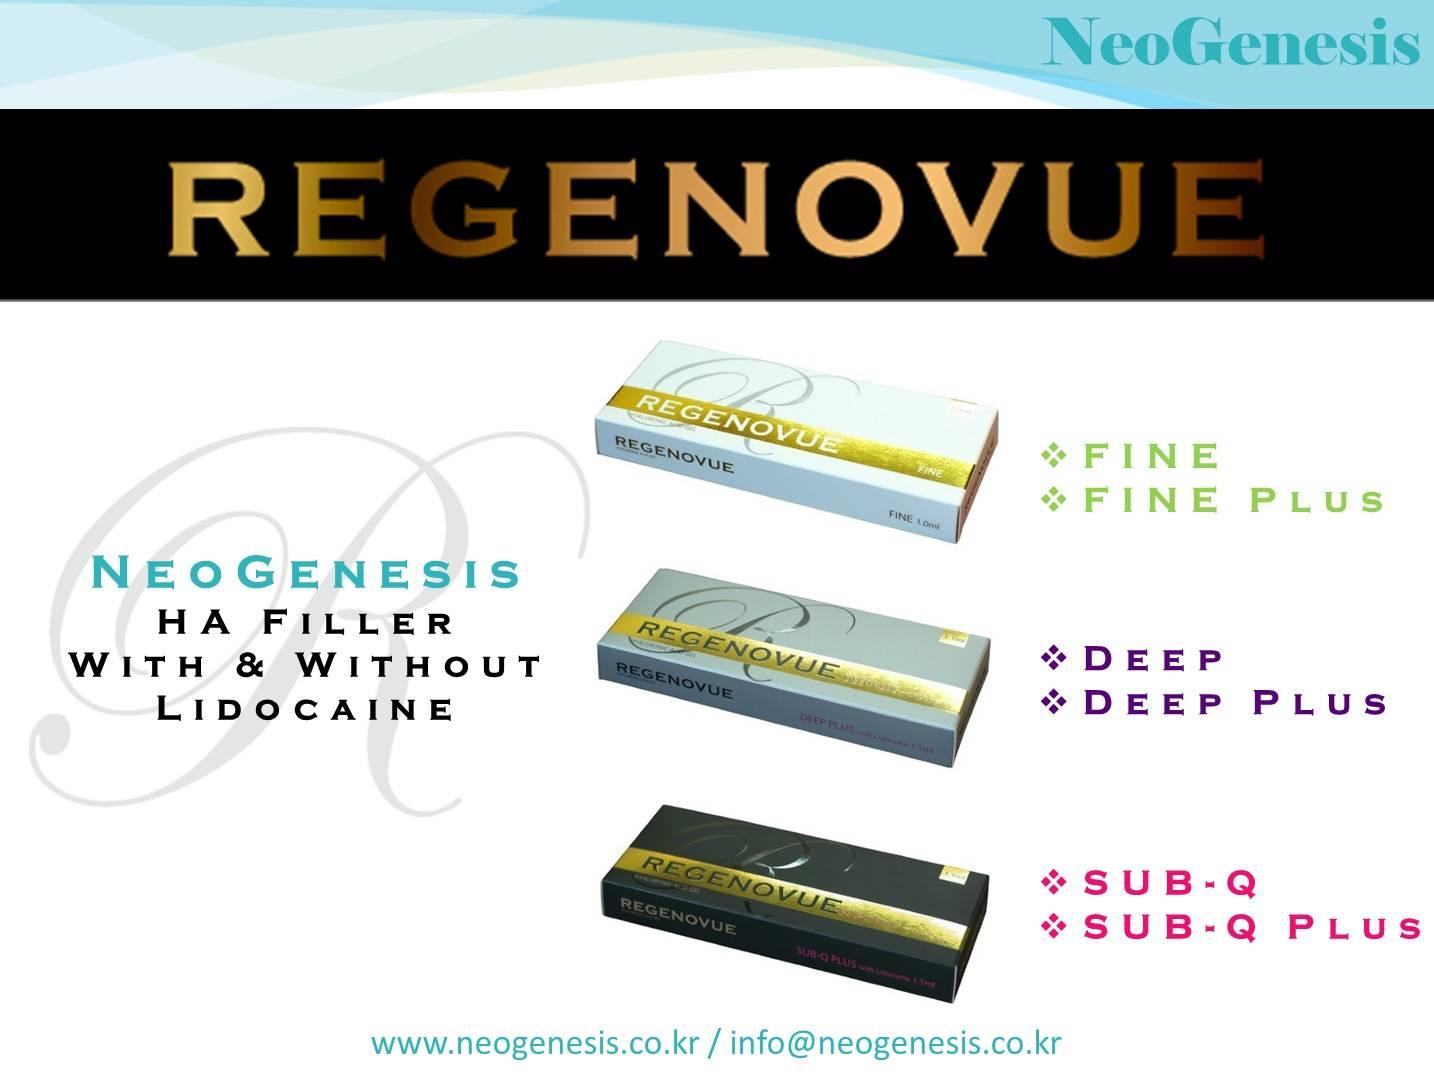 Korean made HA filler Regenovue